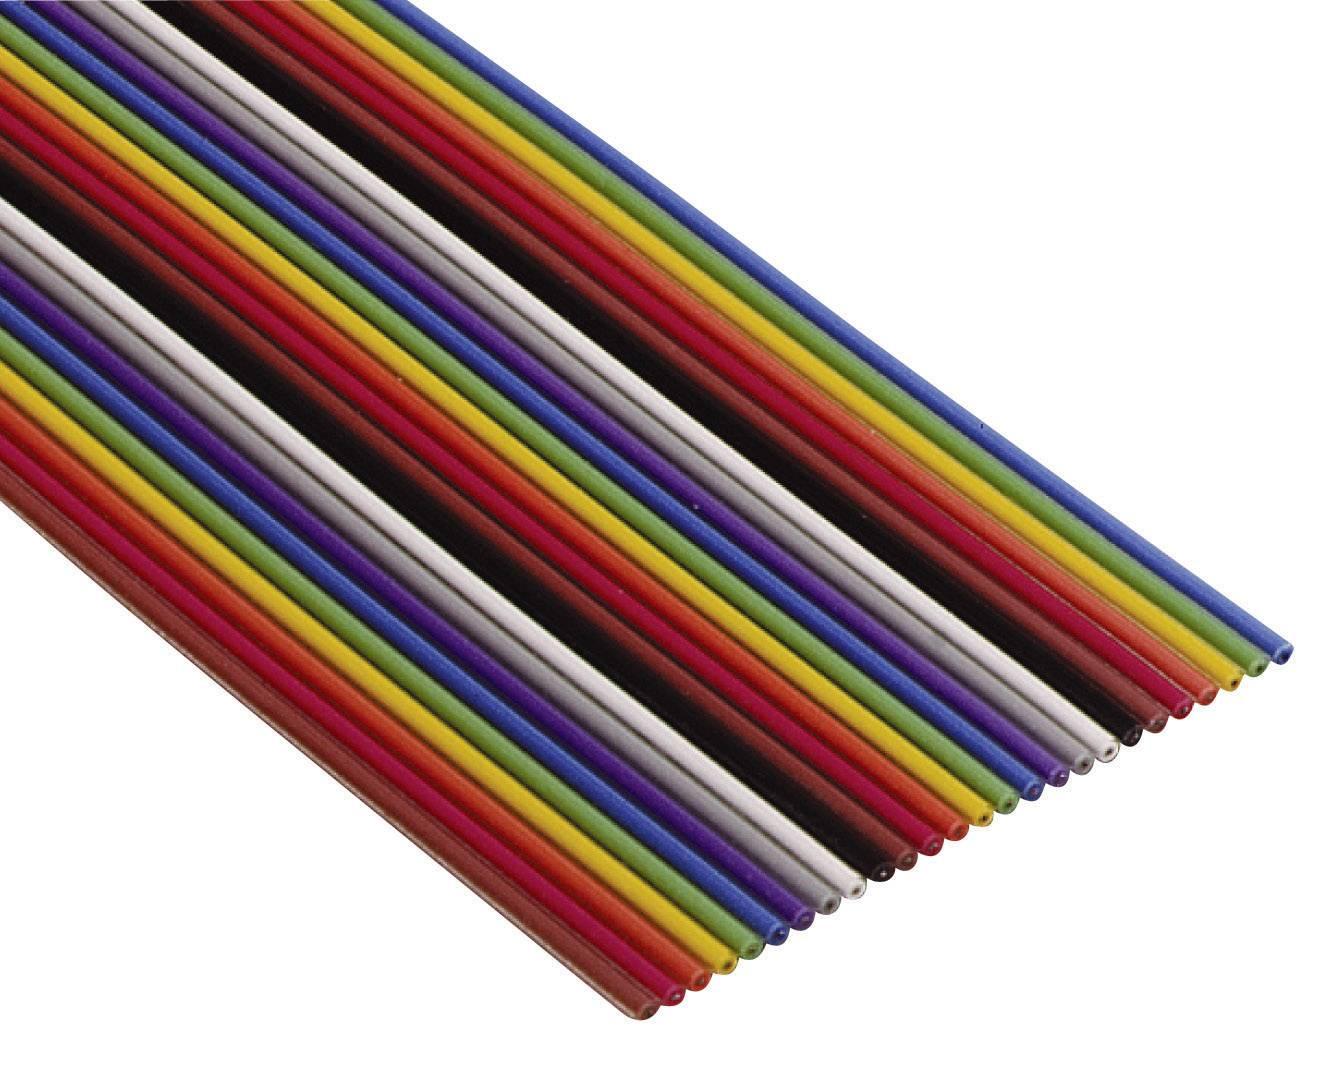 Plochý kabel 3M 3M-3302-50 SF (80610714240), nestíněný, 1 m